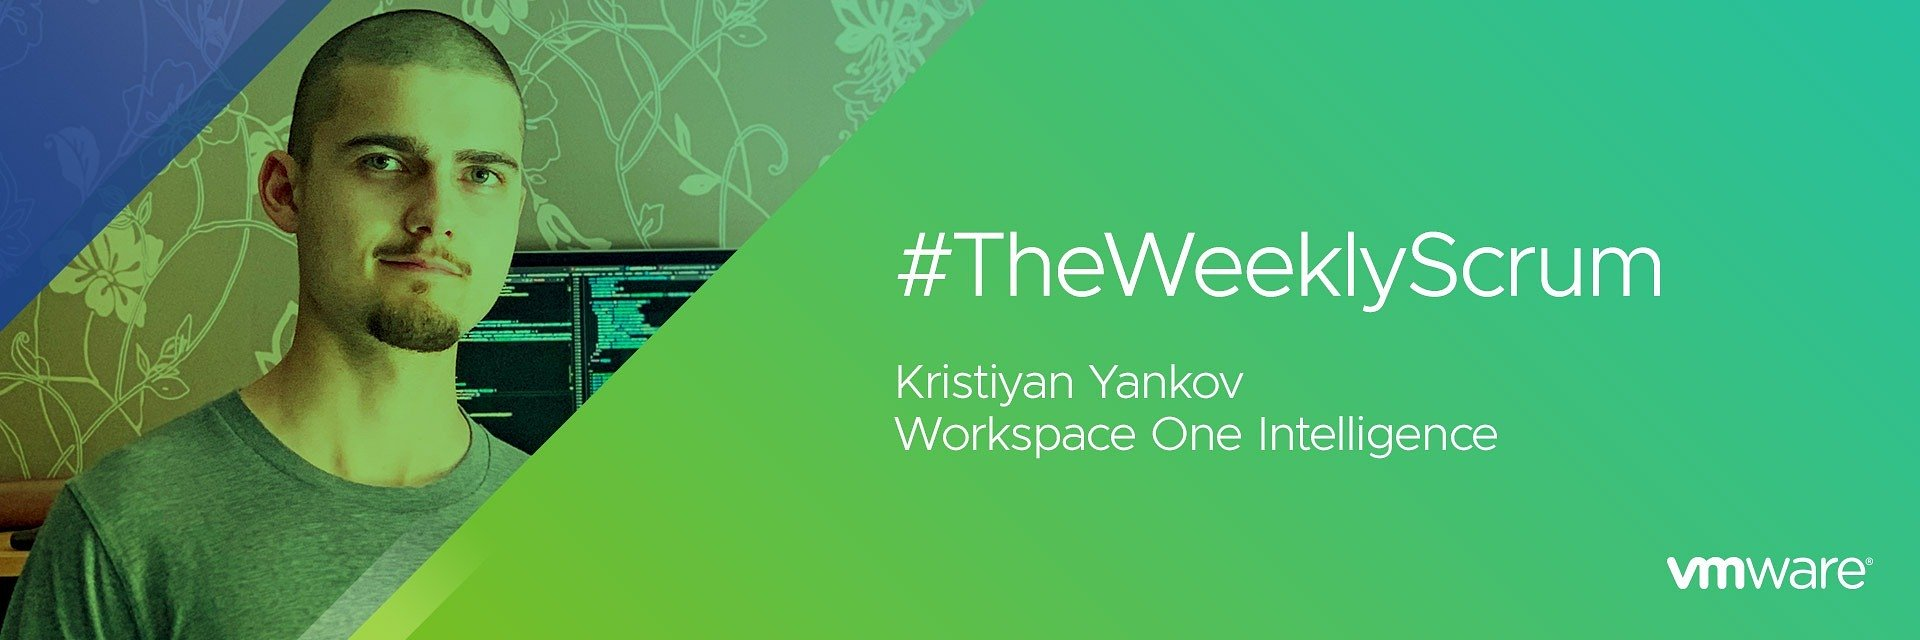 The Weekly Scrum: Kristiyan Yankov